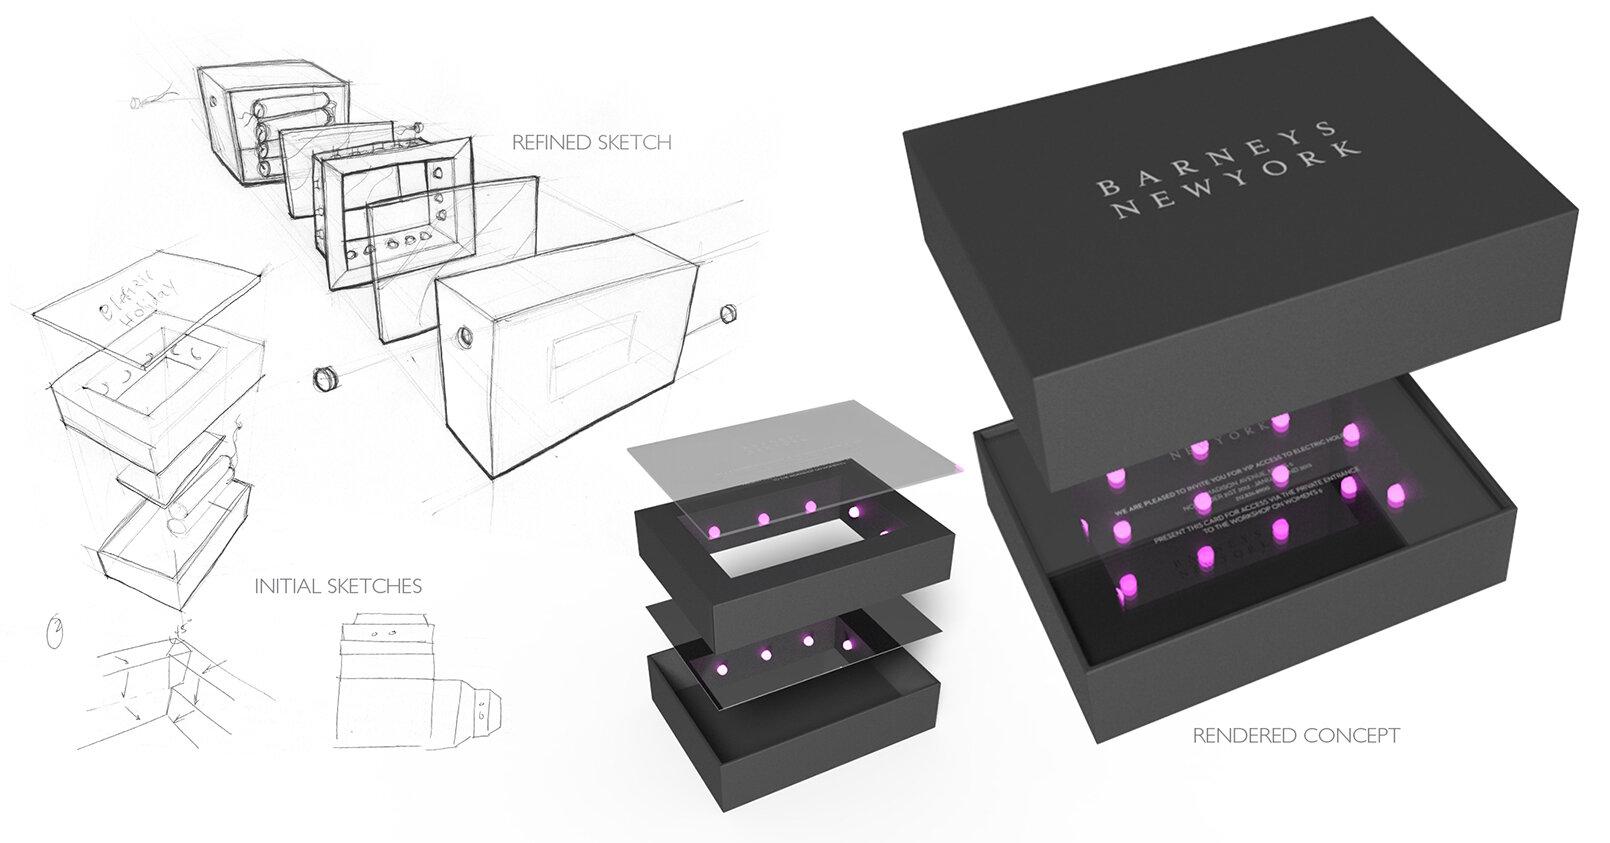 Barneys-New-York-Disney-Holiday-Packaging-Company-Design-5.jpg